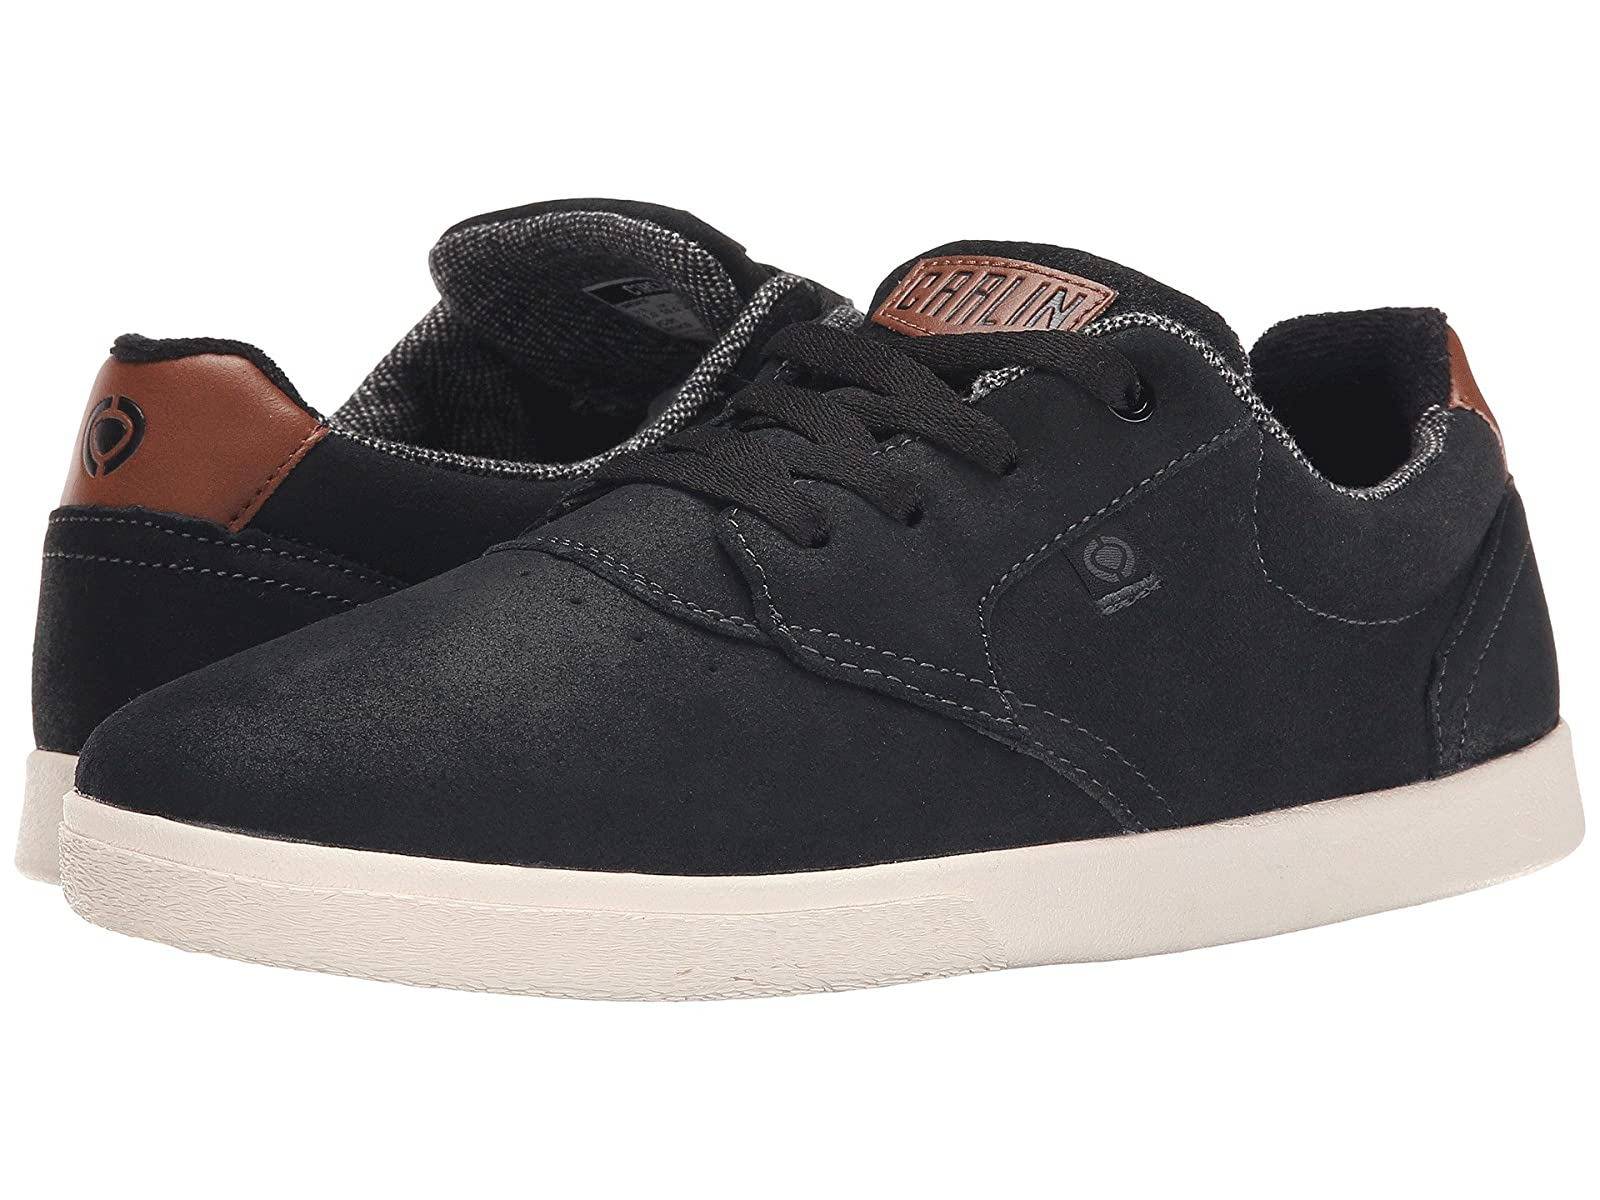 Circa JC01Cheap and distinctive eye-catching shoes